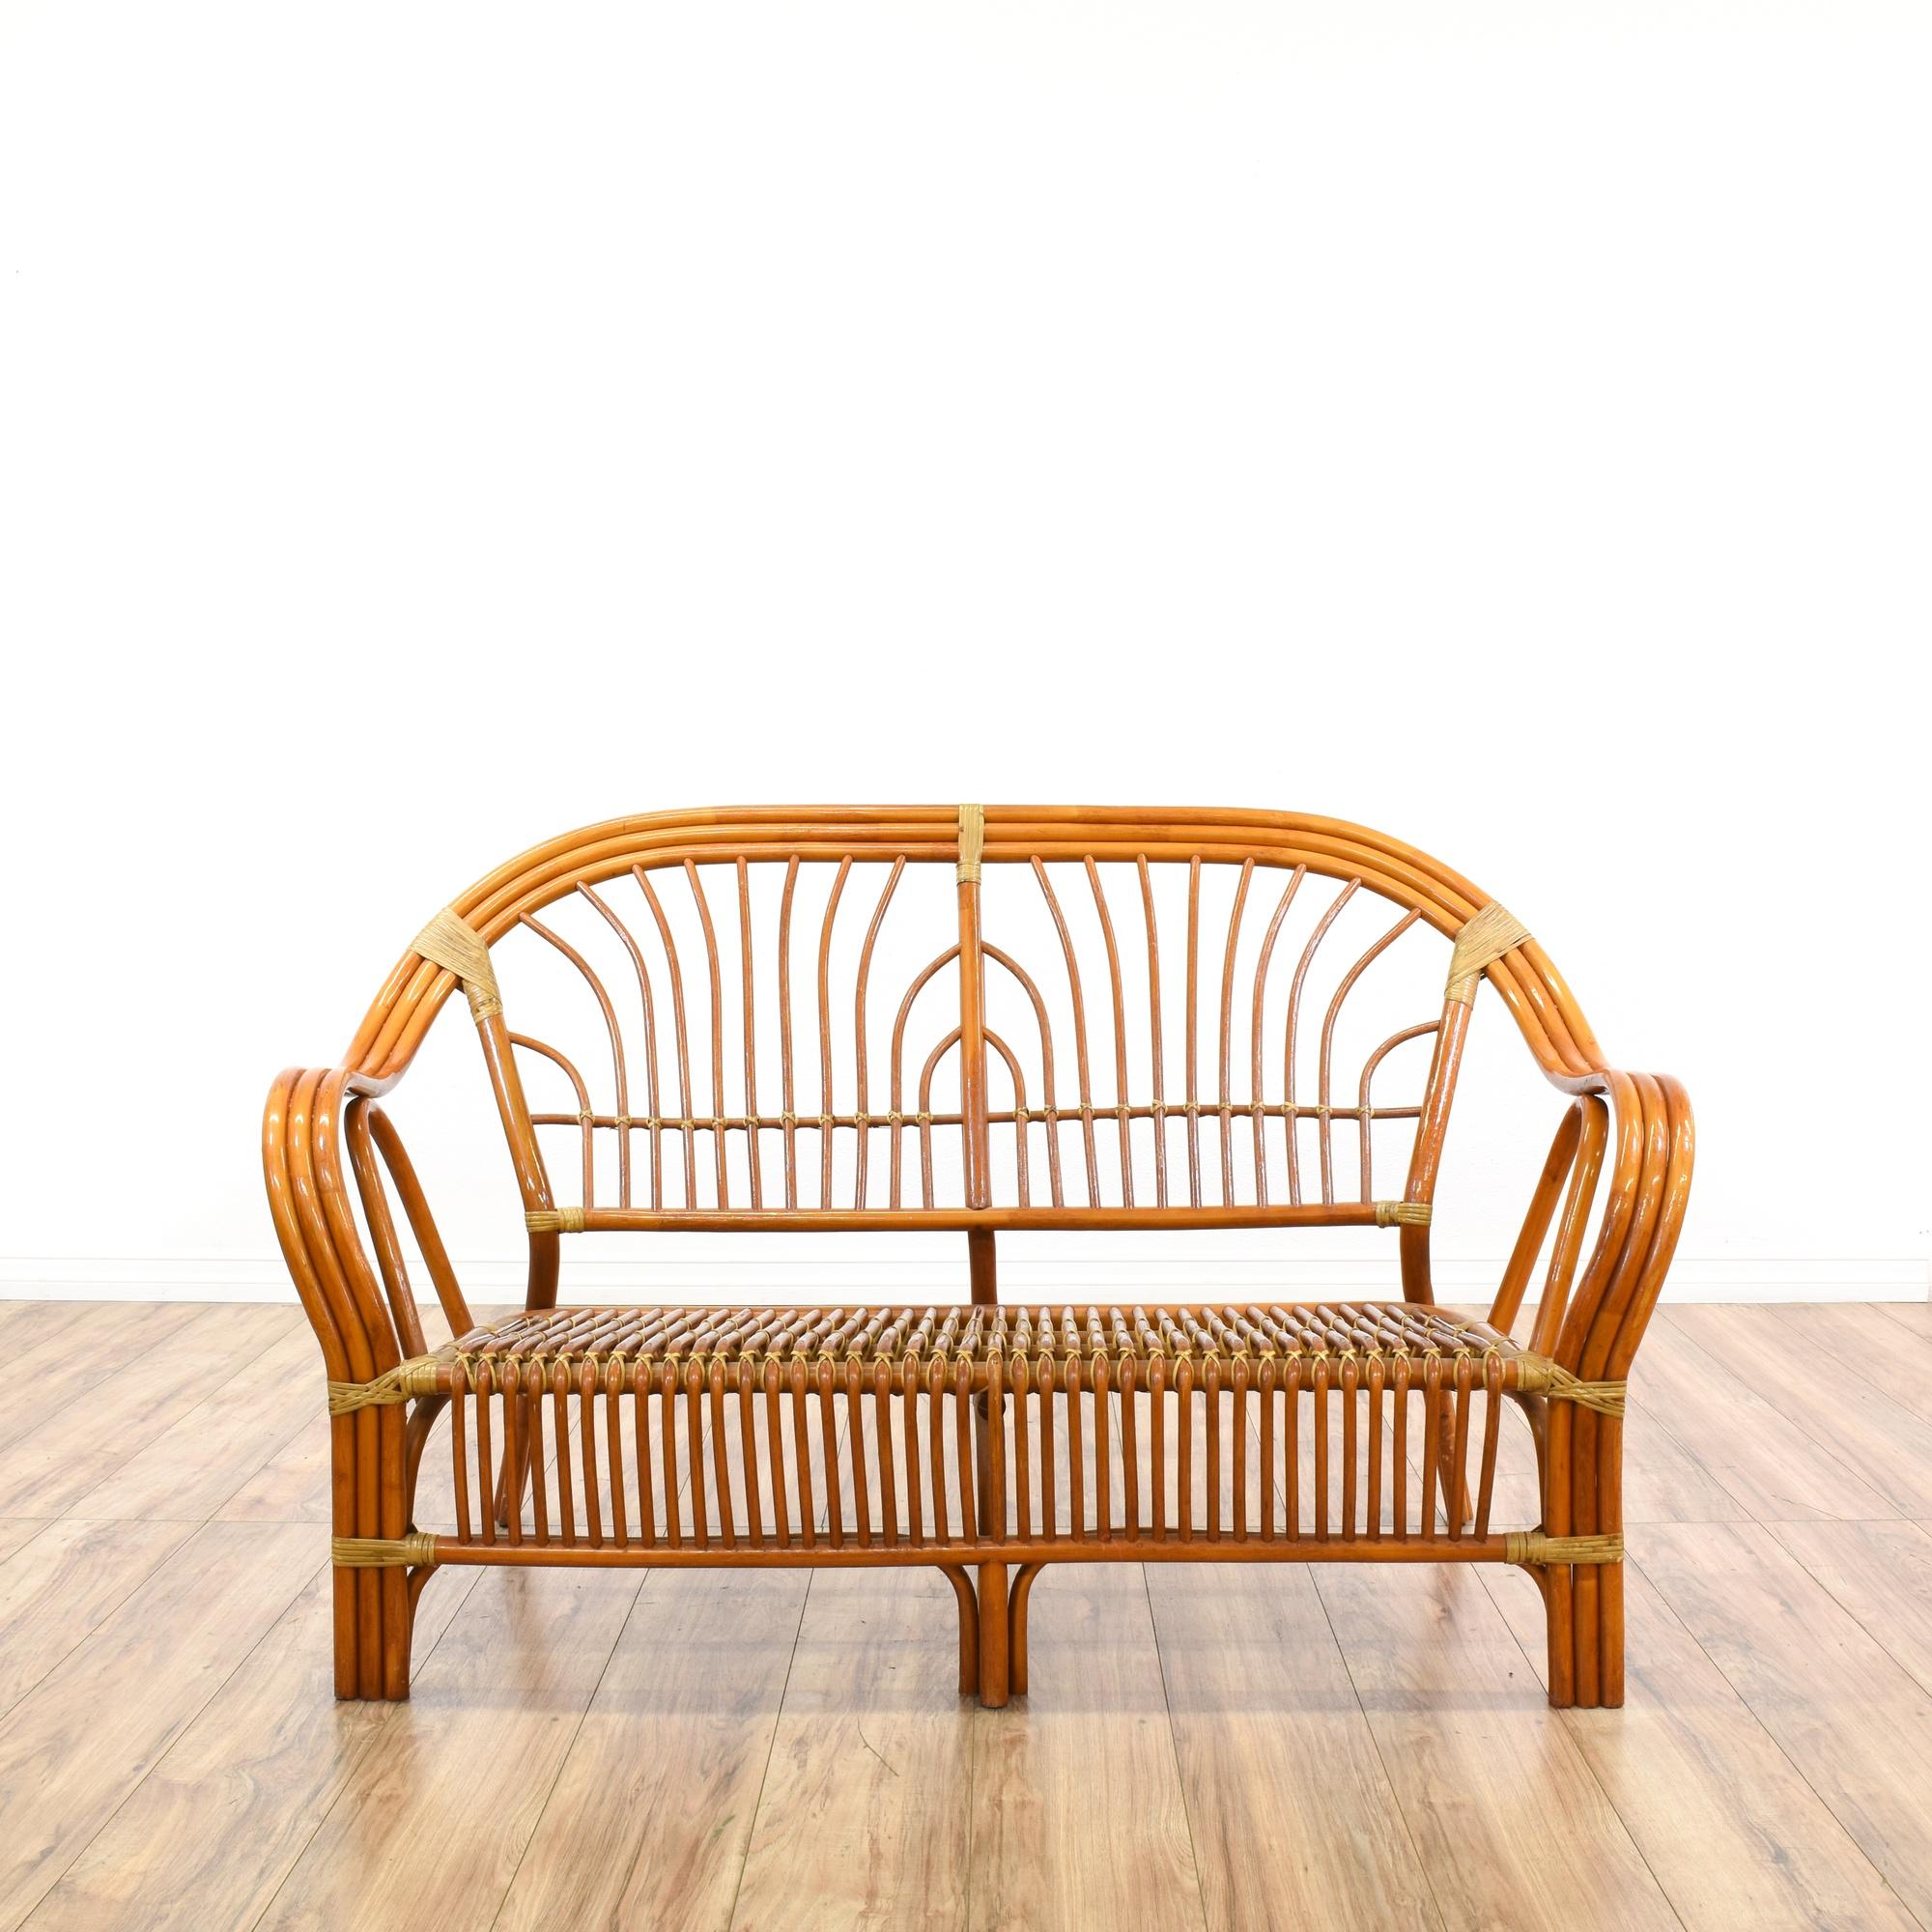 bohemian curved rattan loveseat sofa loveseat vintage furniture san diego los angeles. Black Bedroom Furniture Sets. Home Design Ideas